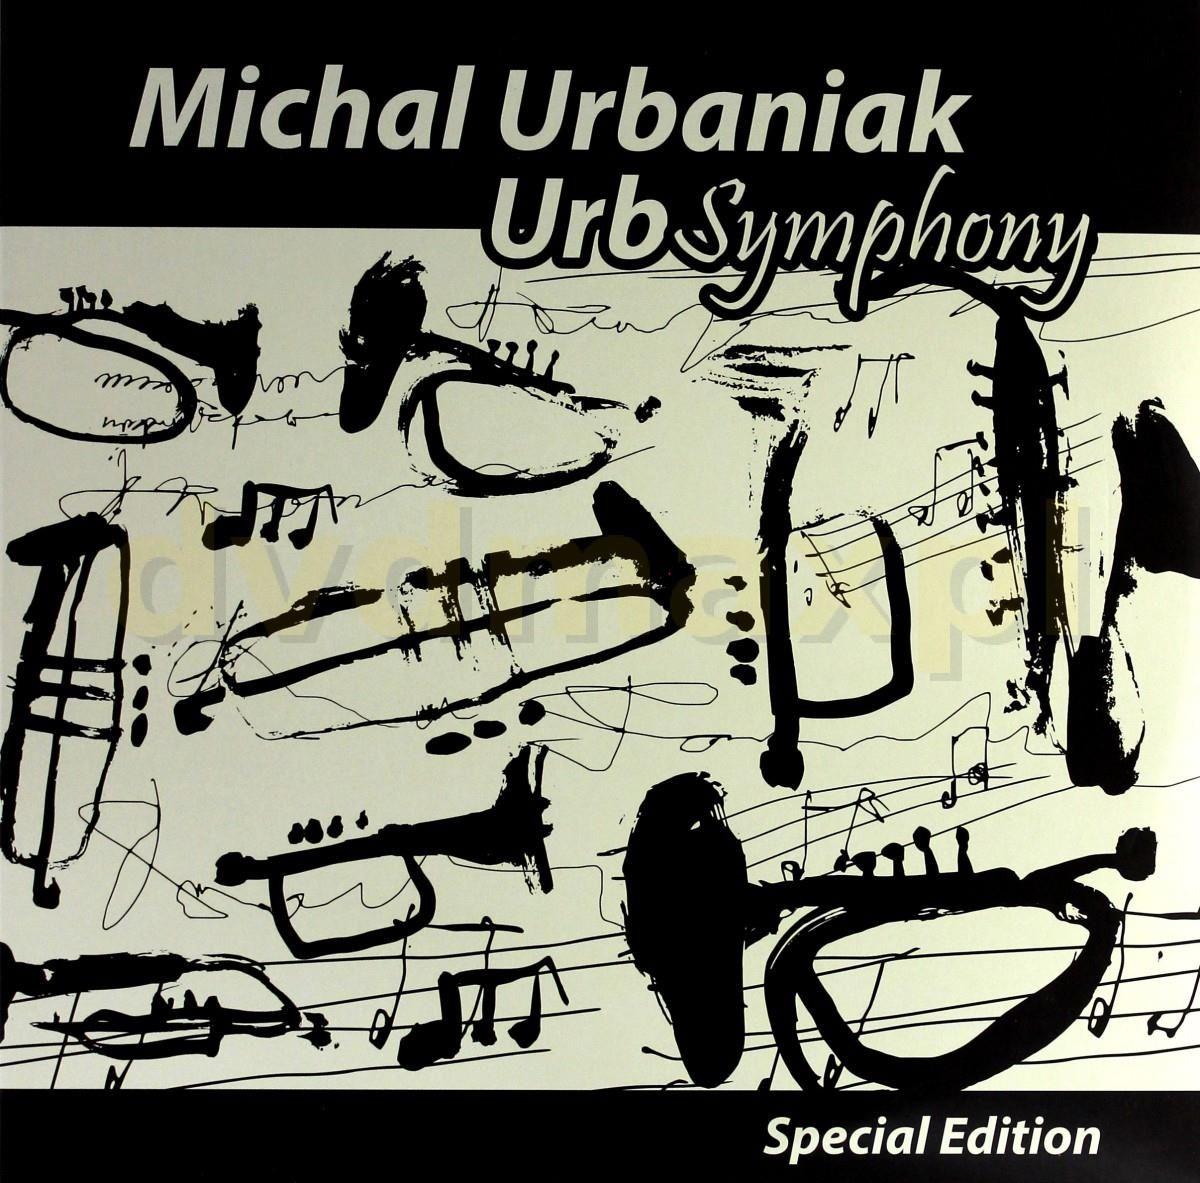 Michał Urbaniak Urbsymphony 2xwinyl